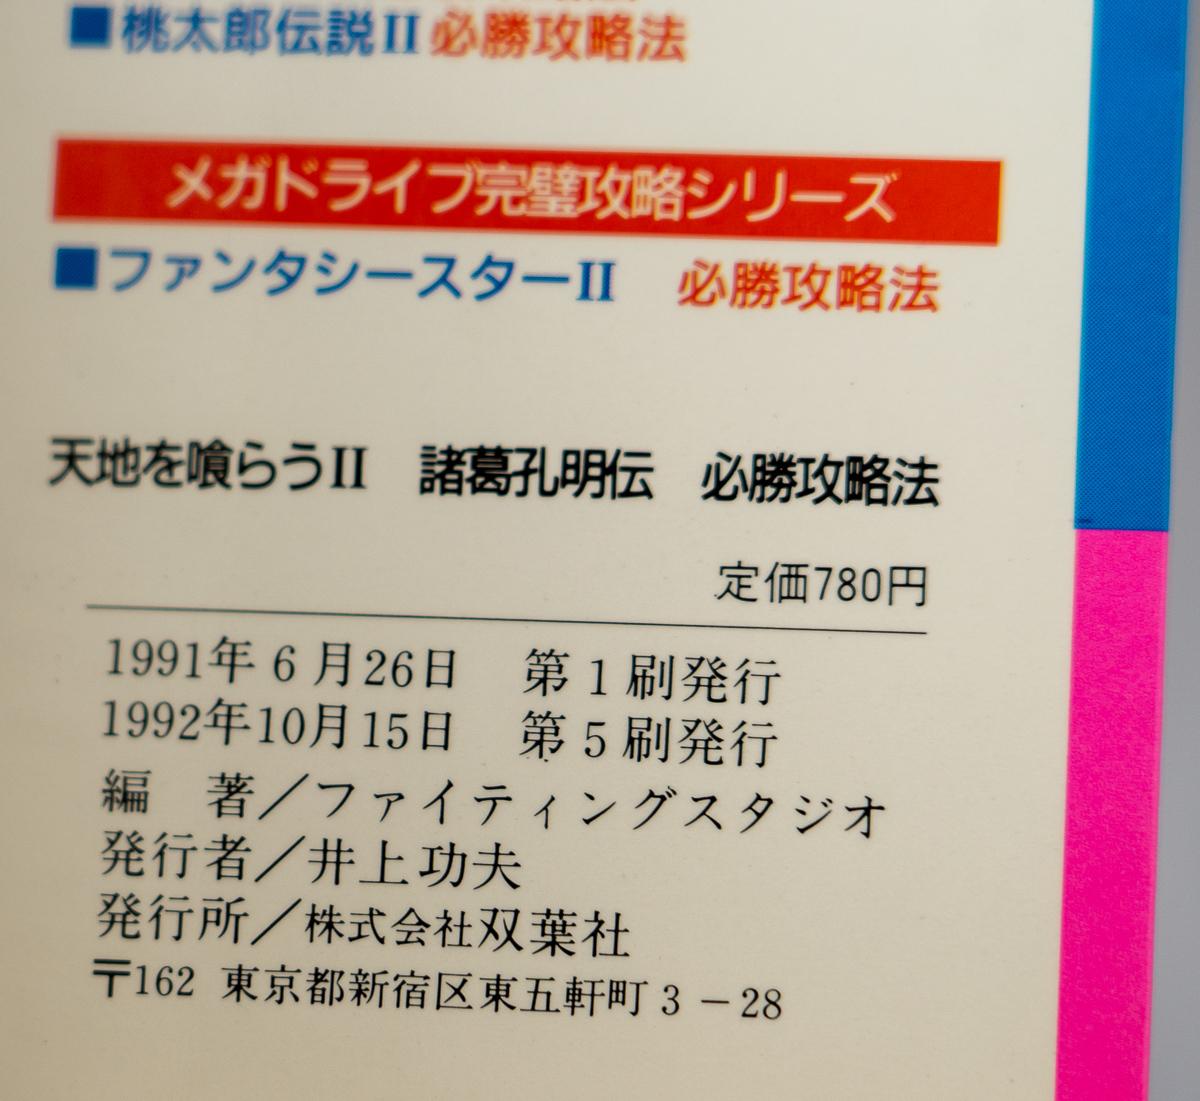 FC 天地を喰らう2 諸葛孔明伝 必勝攻略法_画像6